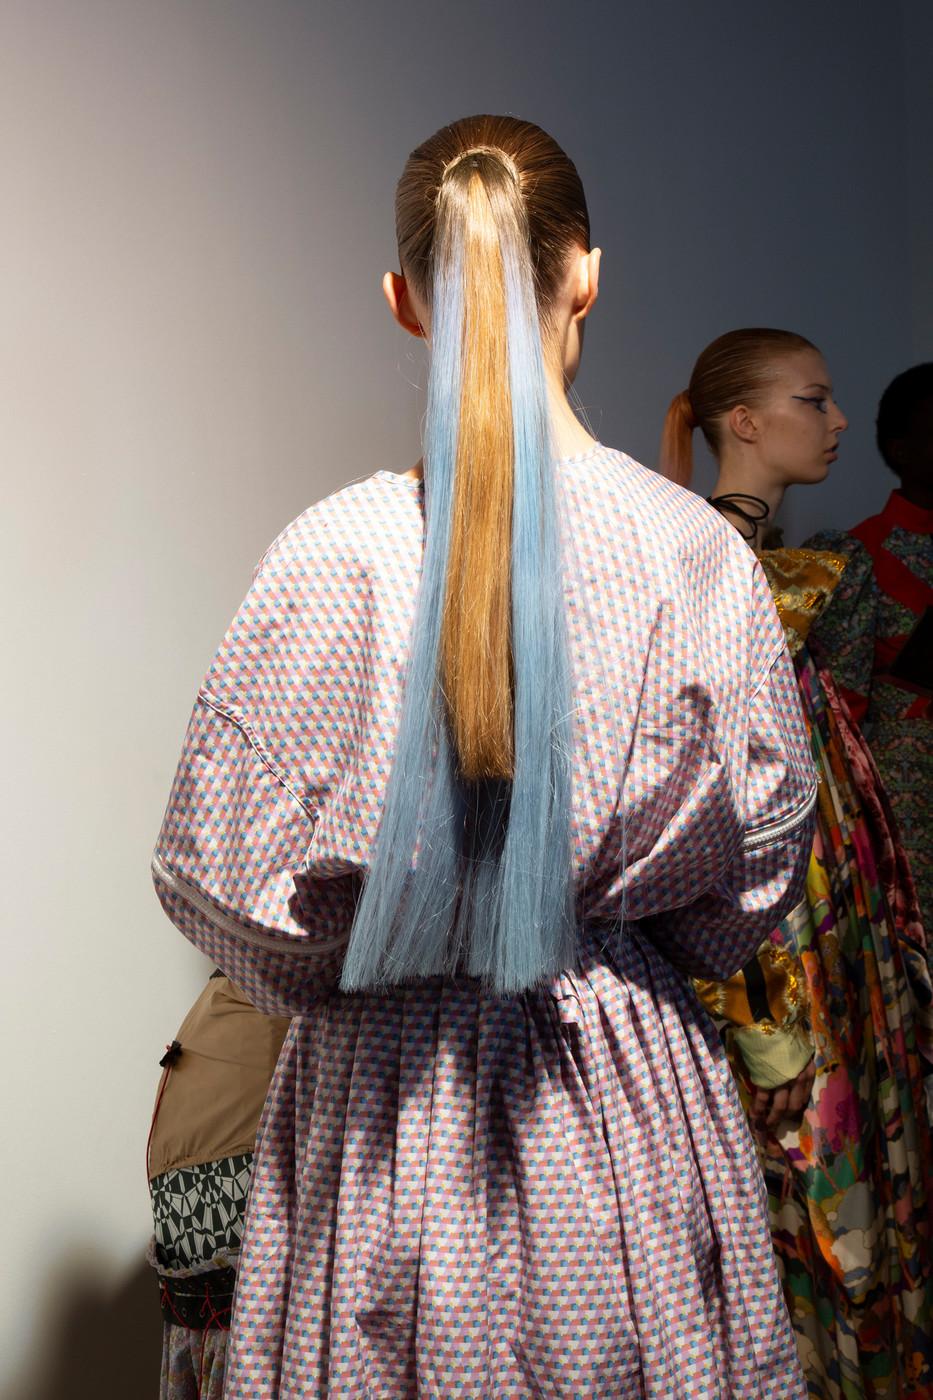 Matty Bowan At London Fashion Week Spring 2020 With Images Fashion Week Fashion